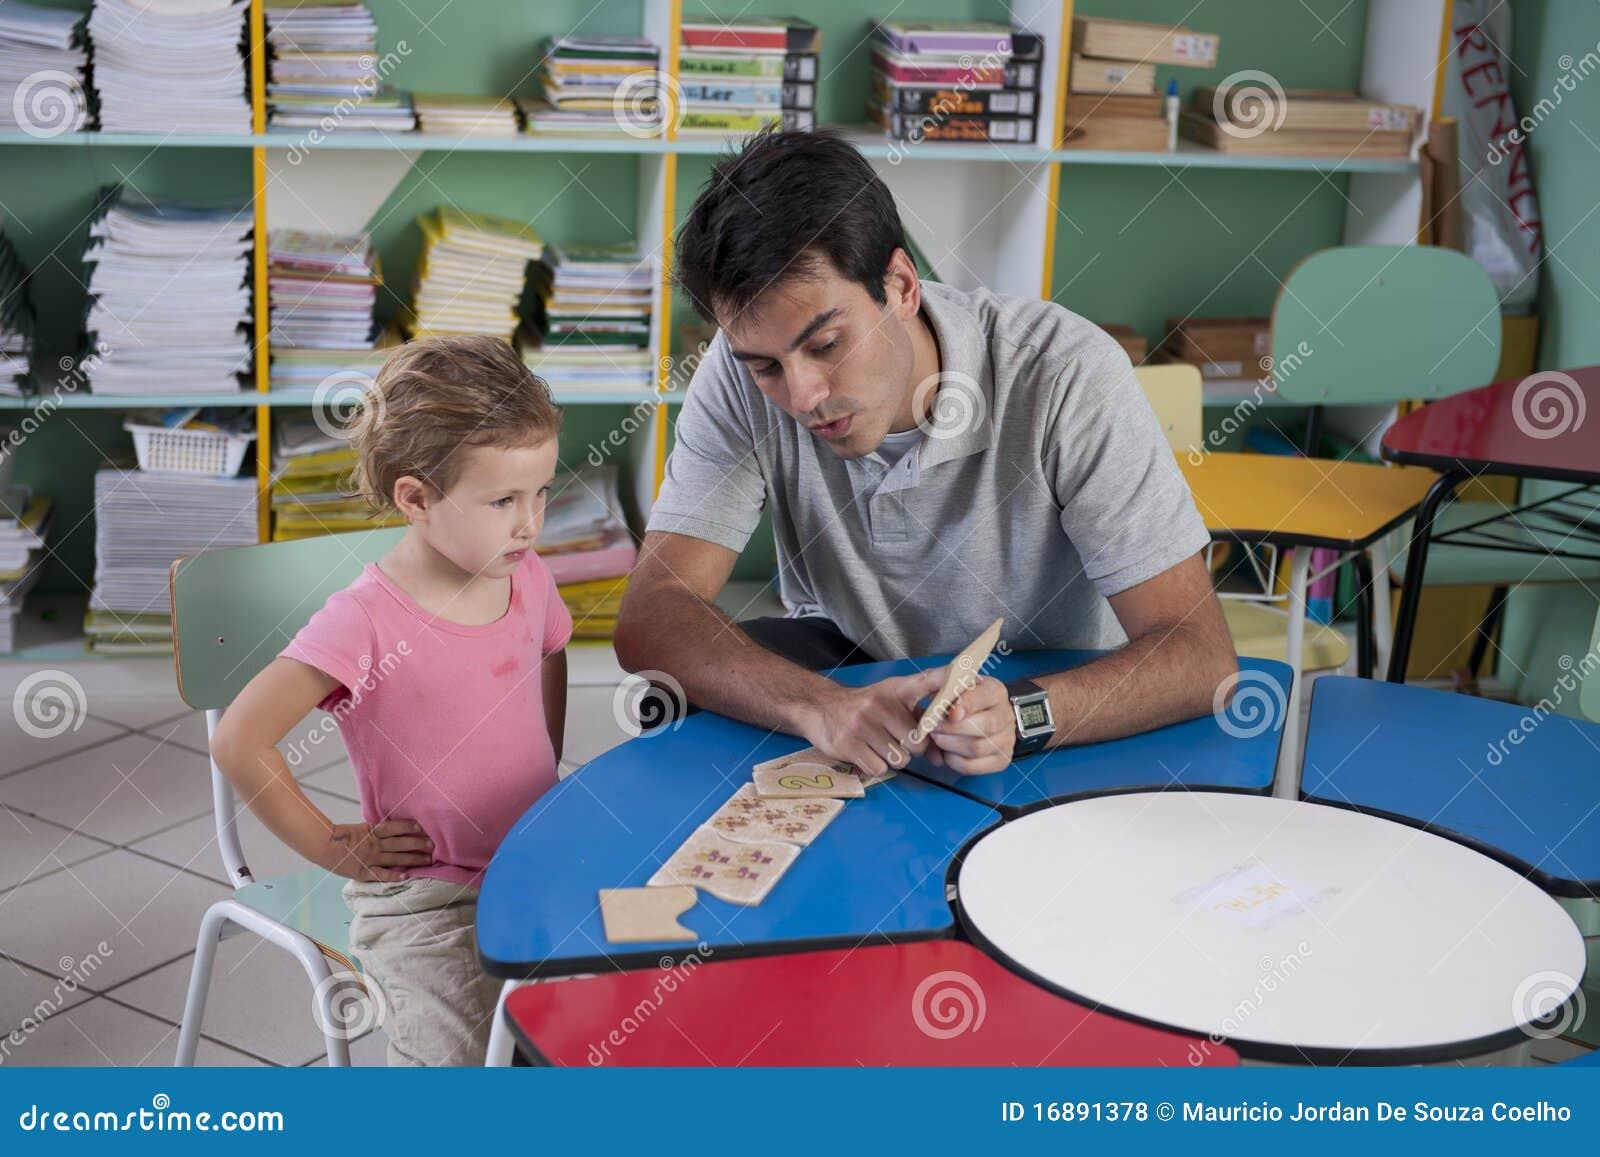 Preschool teacher and child in the classroom